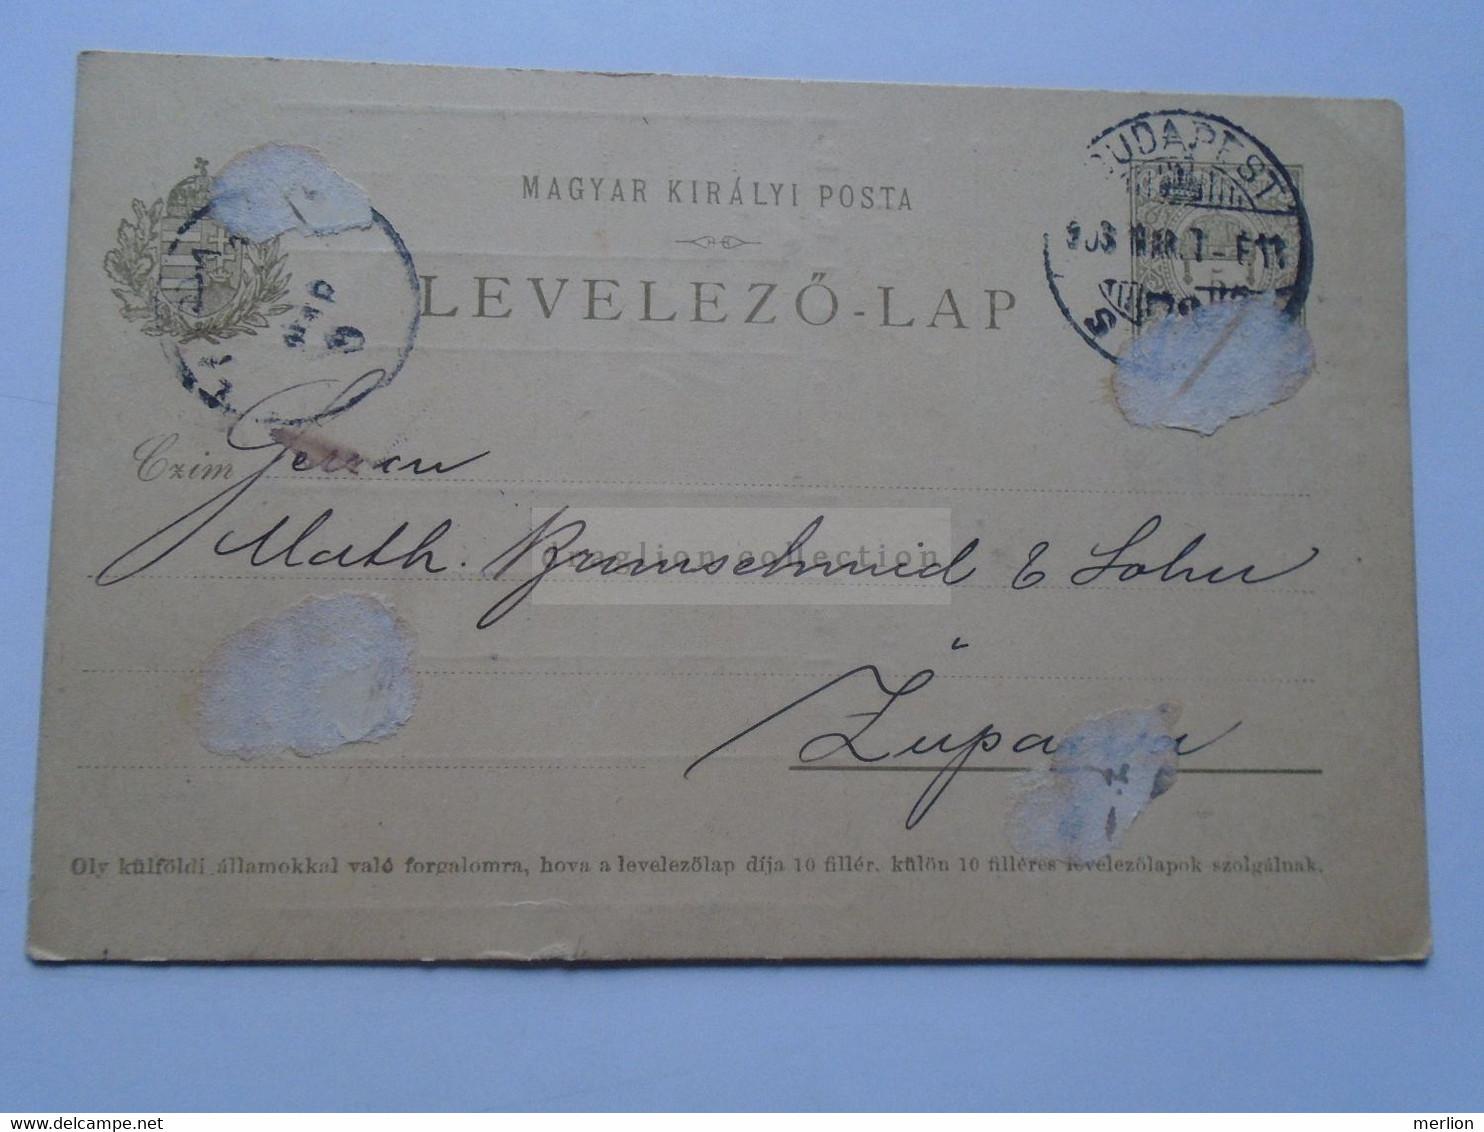 D178681  Hungary  Postal Stationery - 1903 Budapest  Edmund Mauthner Invoice On Backside To ZUPANJE Kroatien Croatia - Sin Clasificación